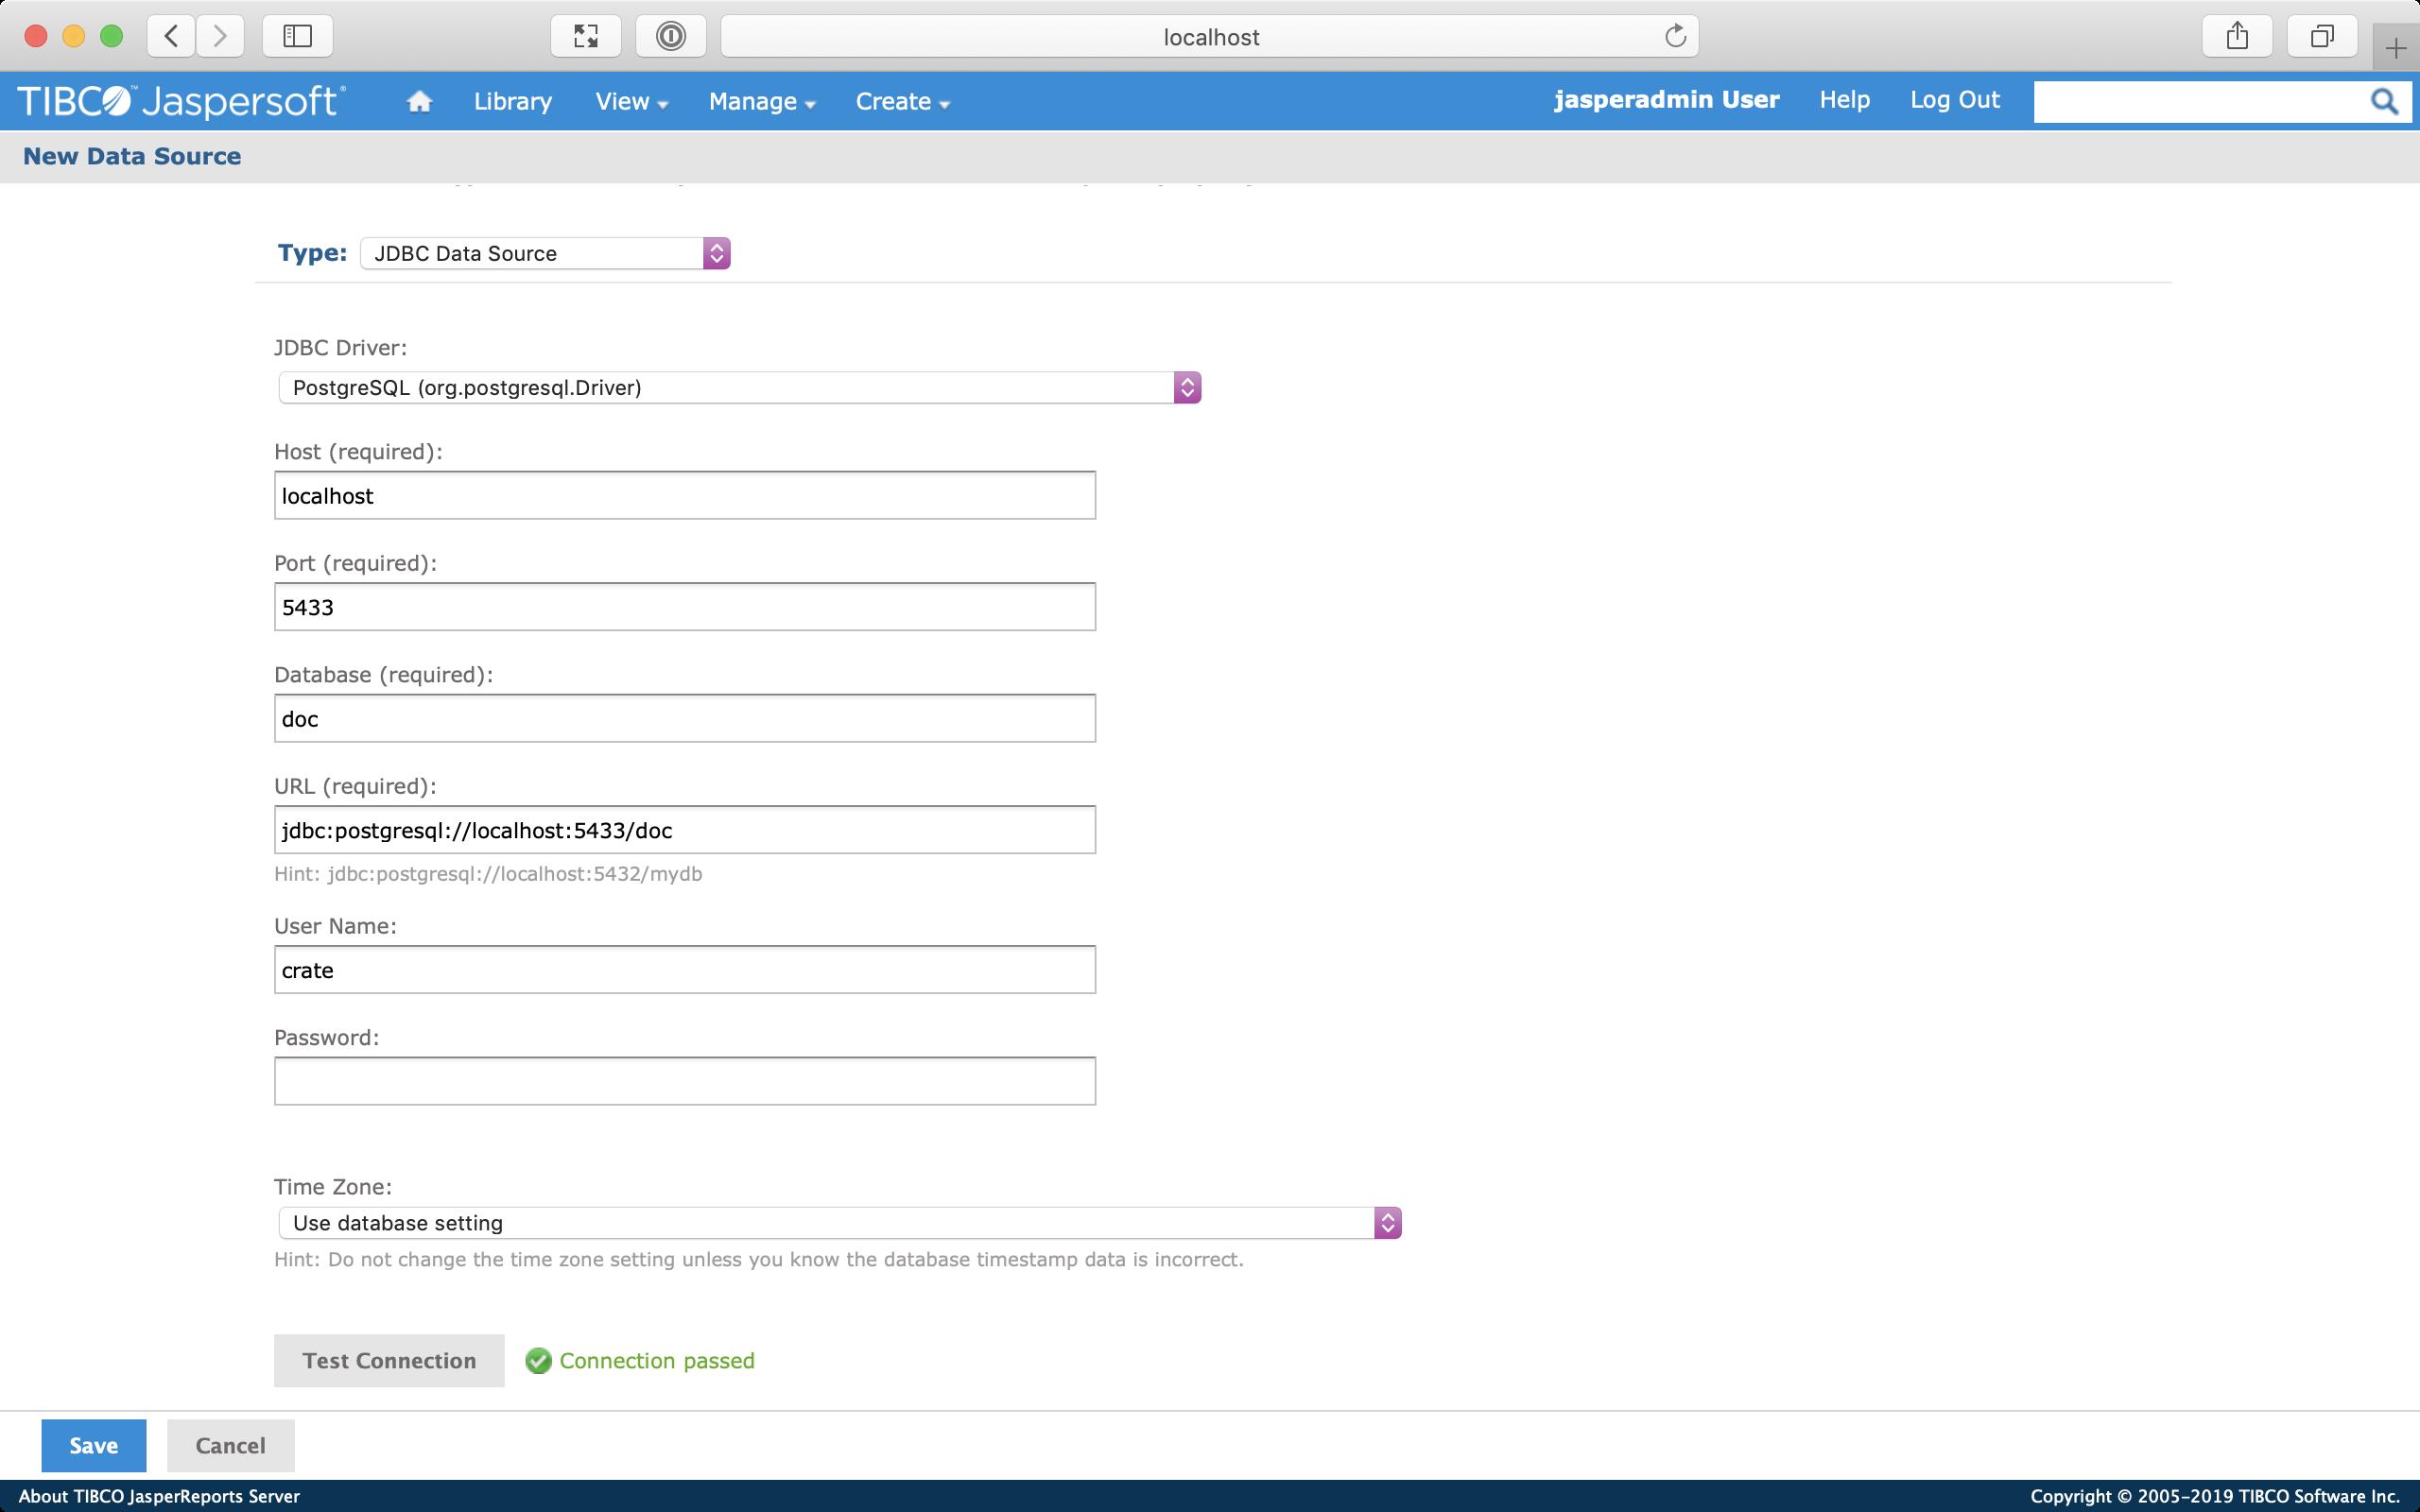 Screenshot of the New Data Source screen